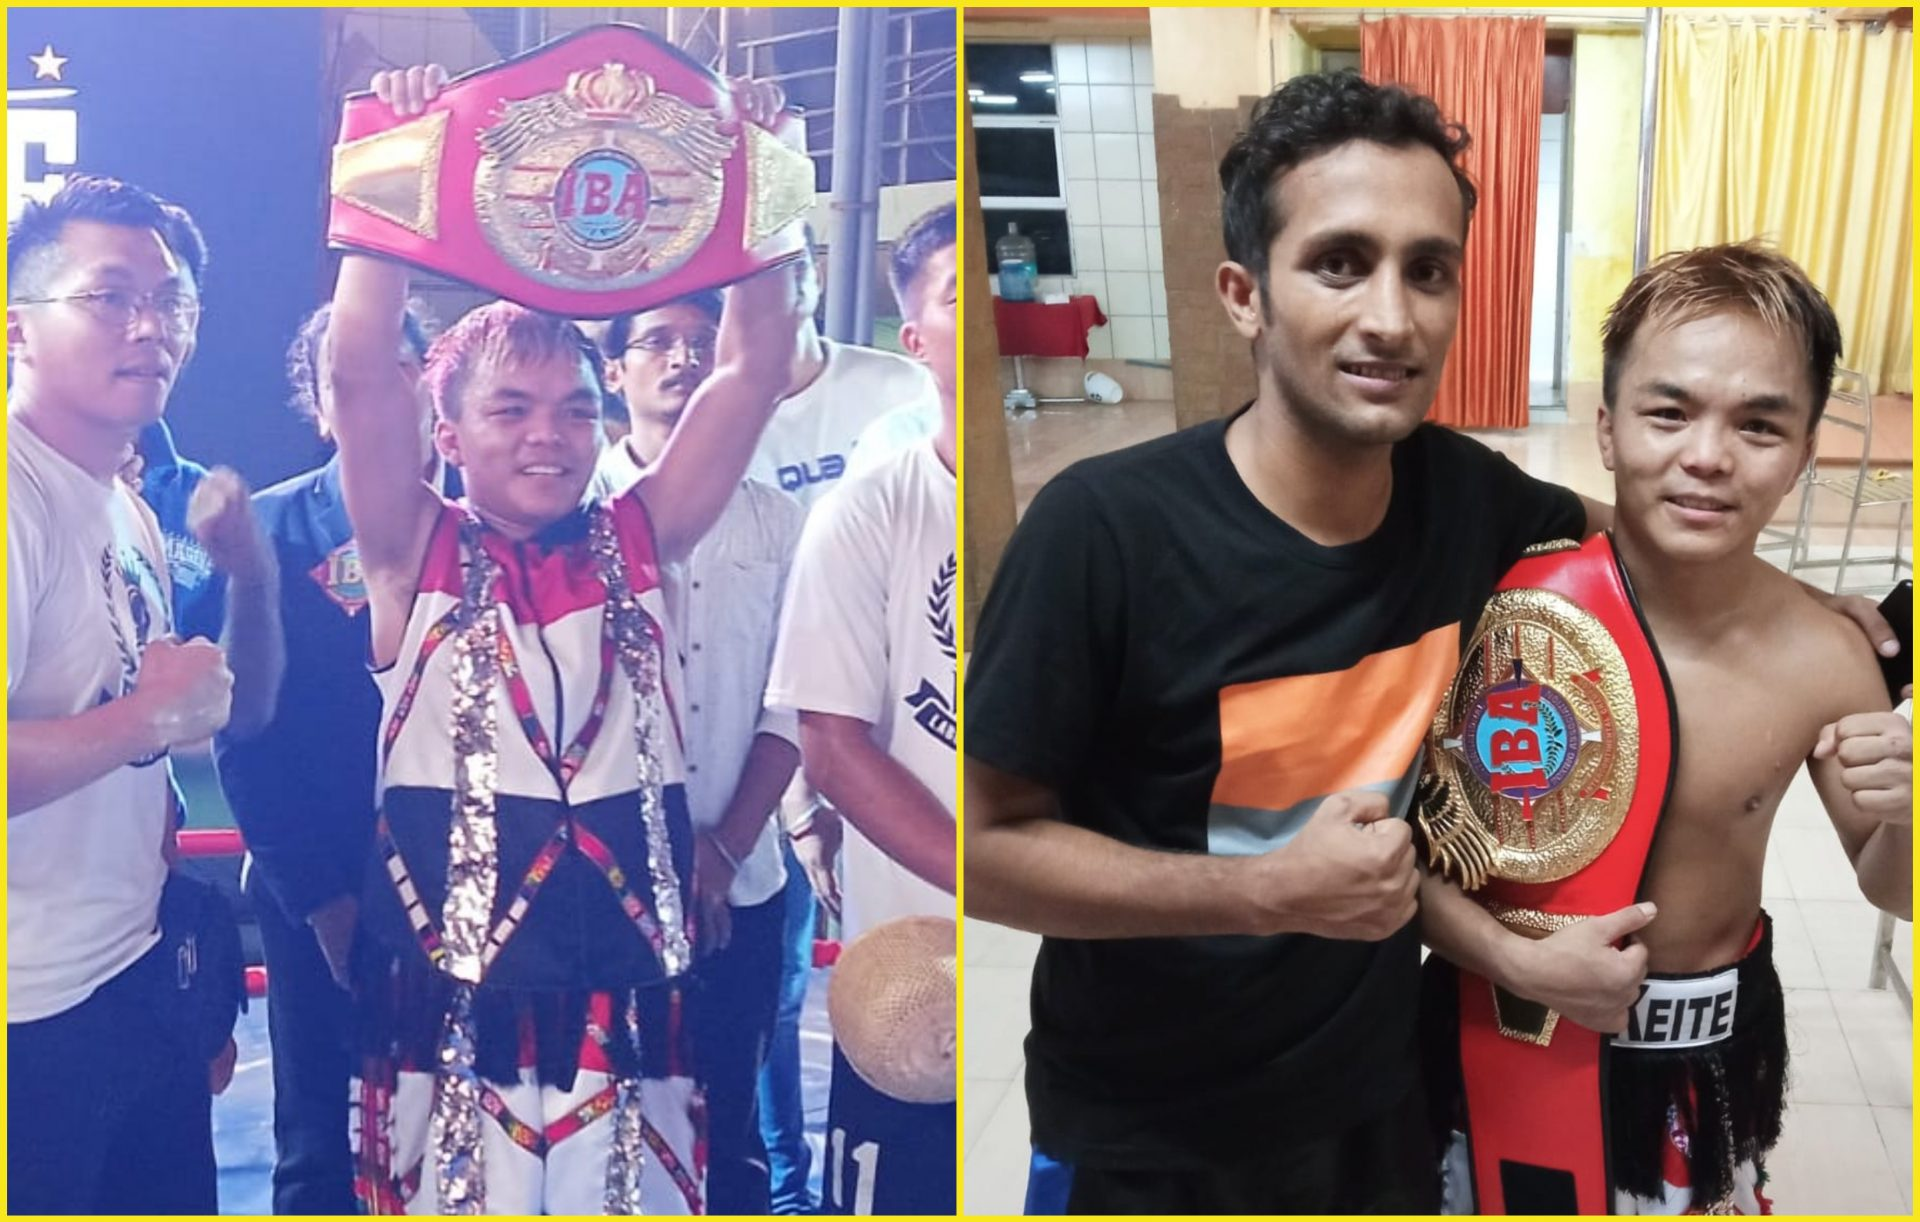 Mizoram boxer Nutlai Lalbiakkima destroys opponent to become new IBA intercontinental title - Nutlai Lalbiakkima